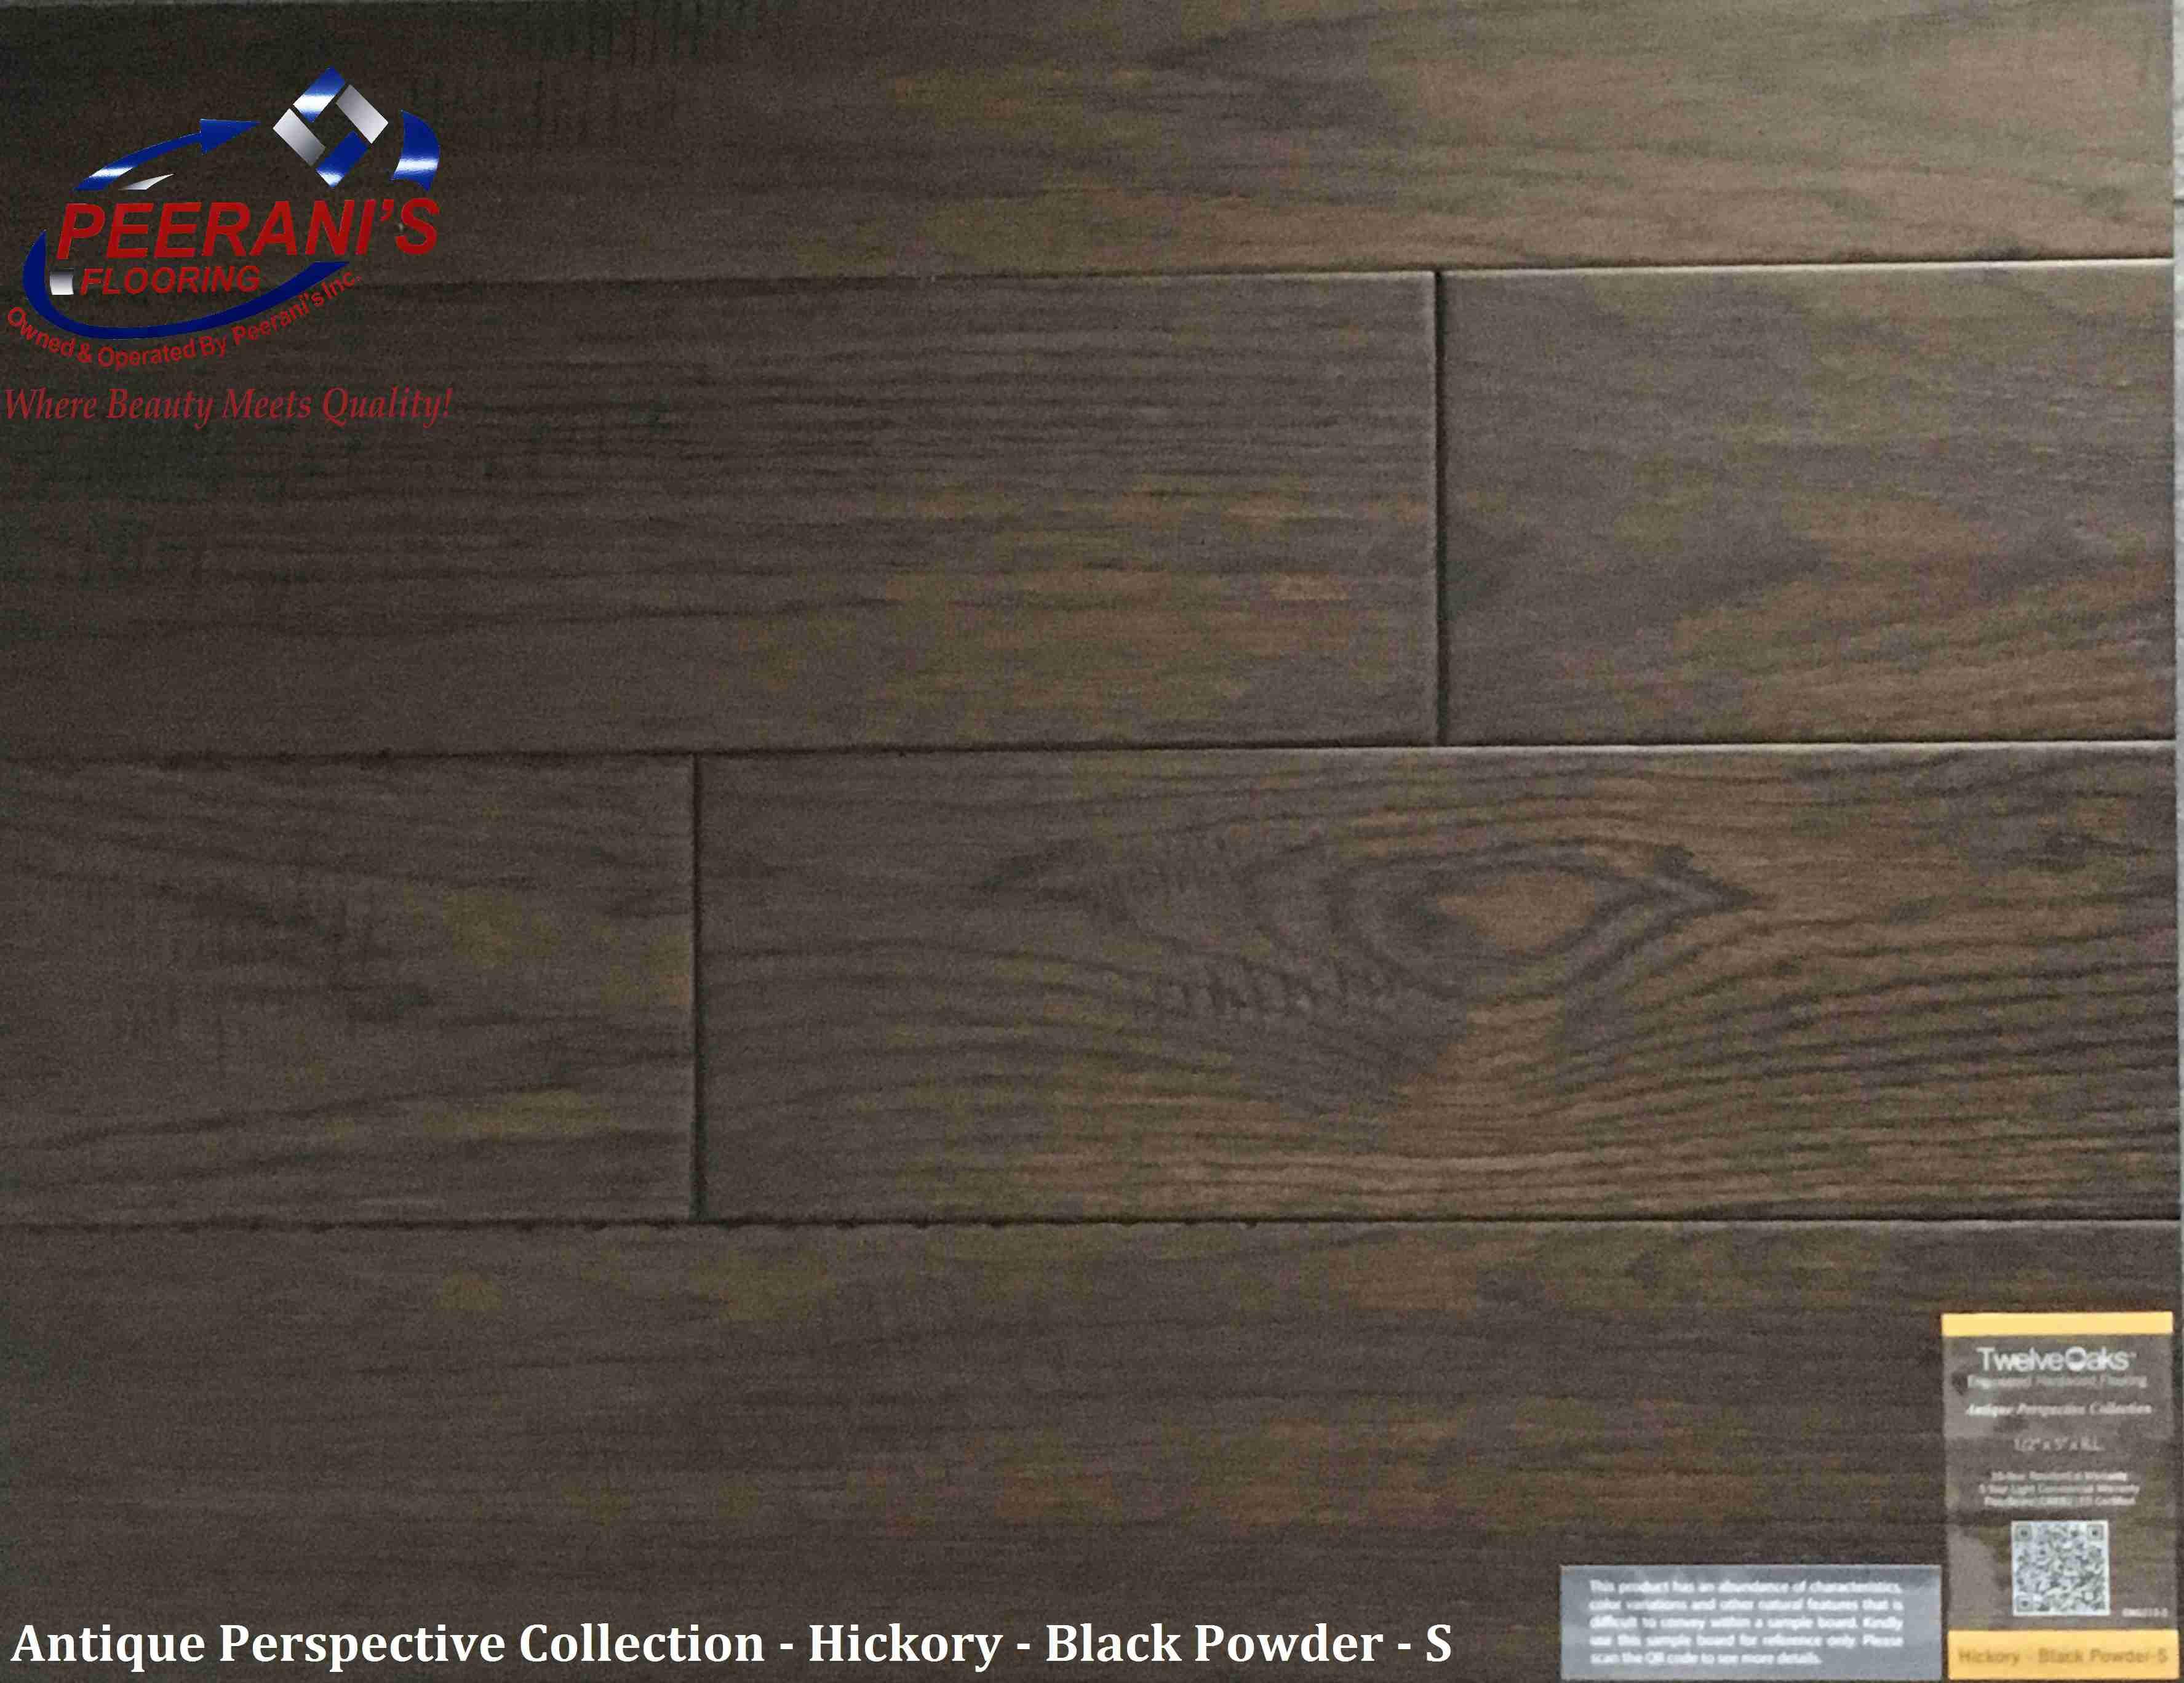 amber acacia hardwood flooring of twelve oaks engineered archives page 2 of 3 peeranis for apc hickory black powder s